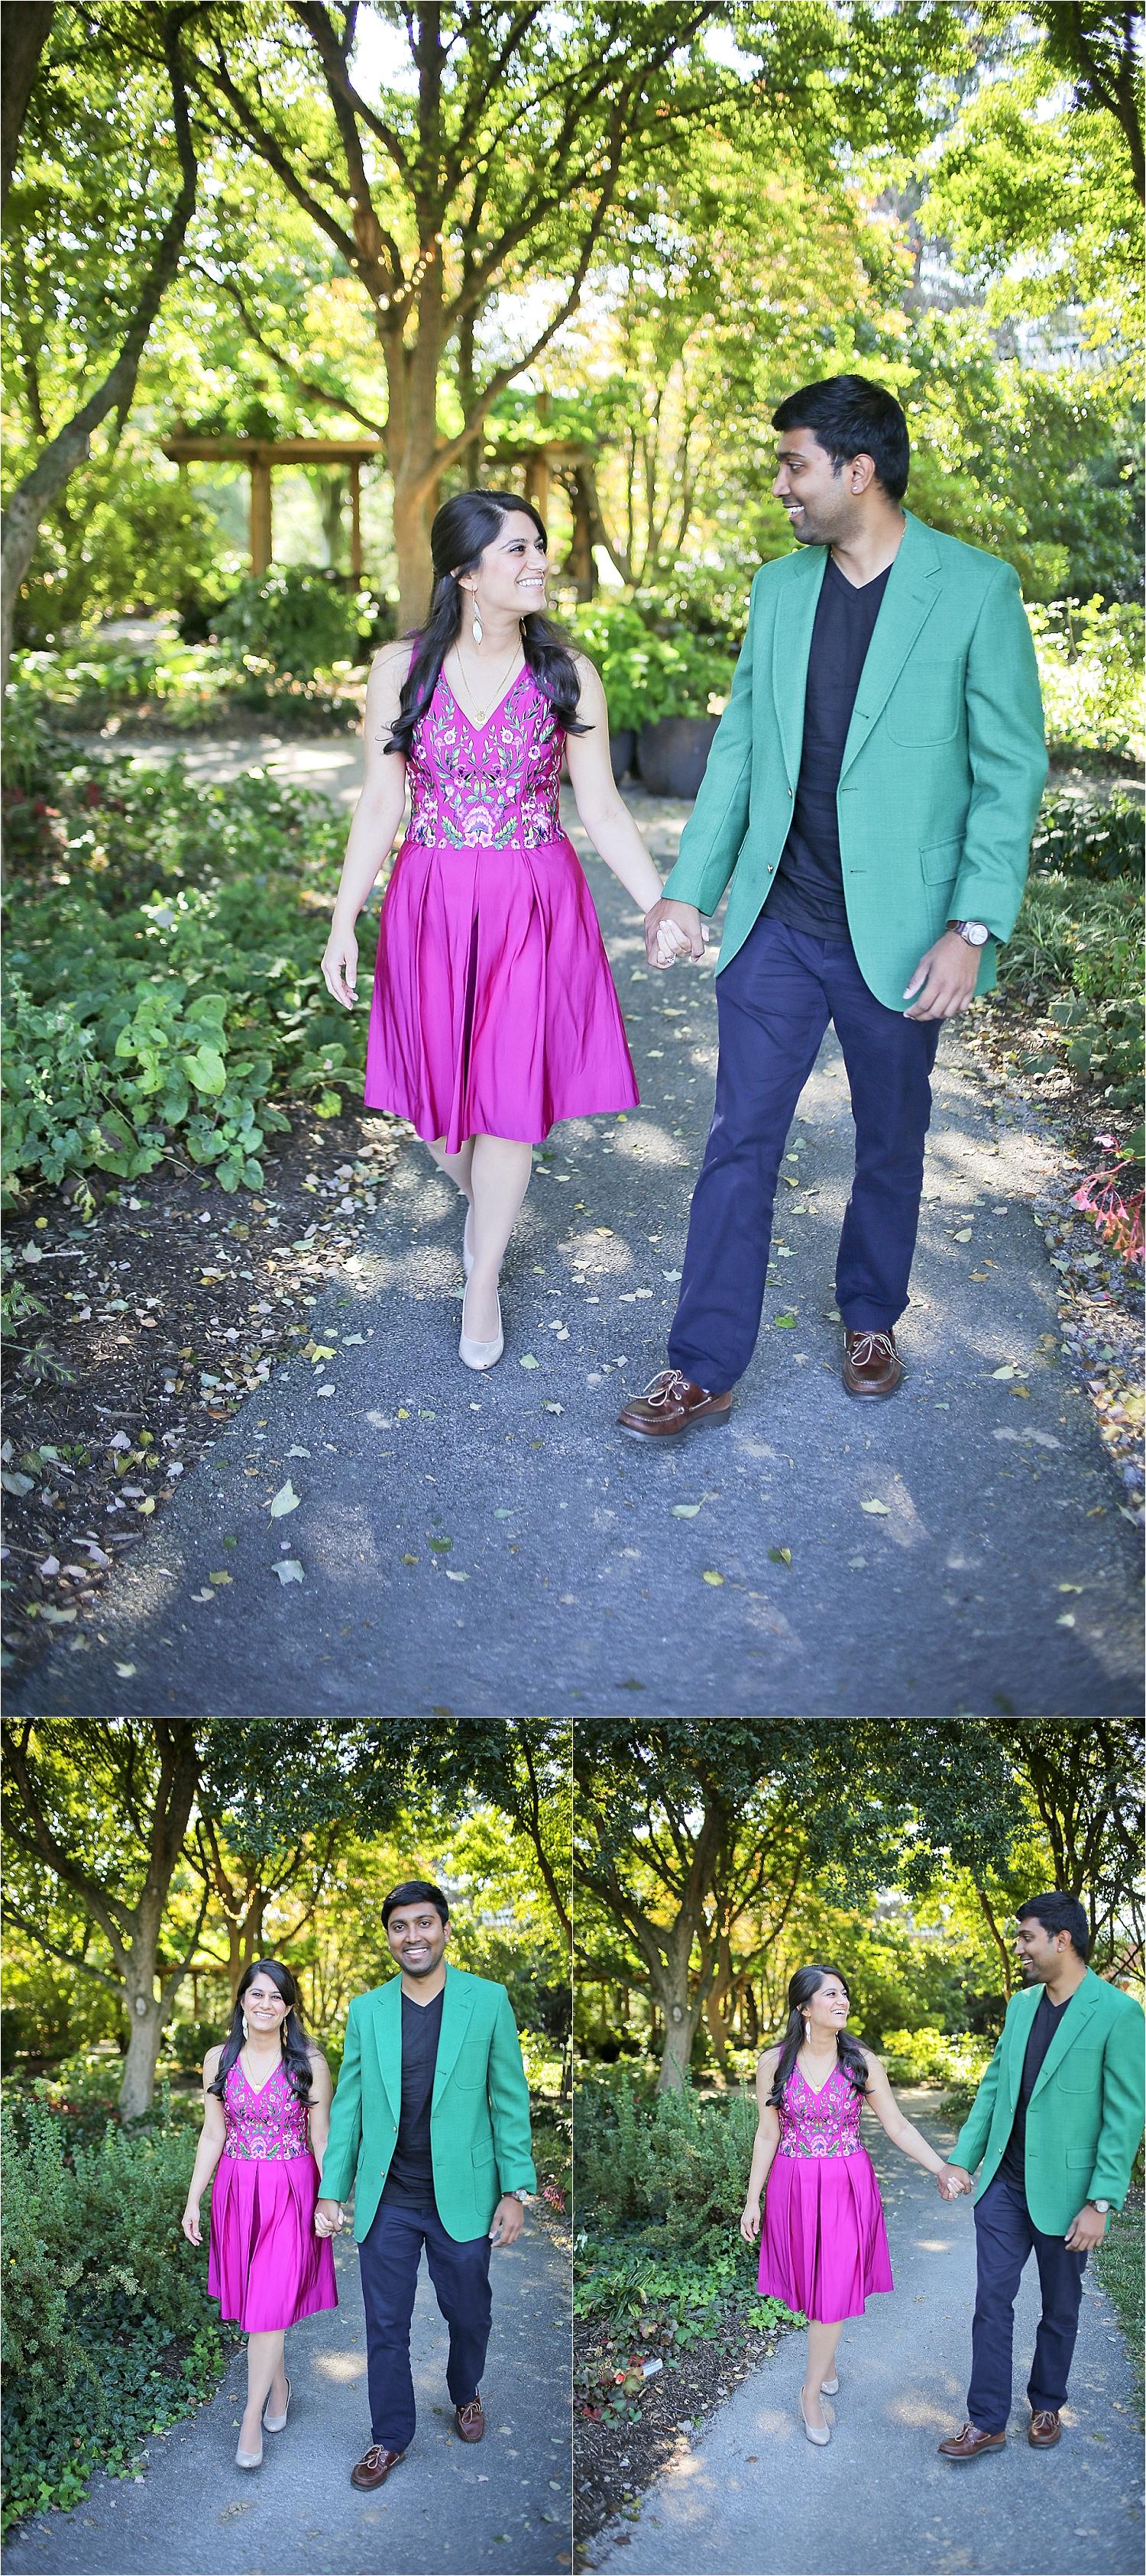 Blacksburg-Virginia-Engagement-Photographer-Hahn-Horticulture-Garden-Virginia-Tech_0001.jpg